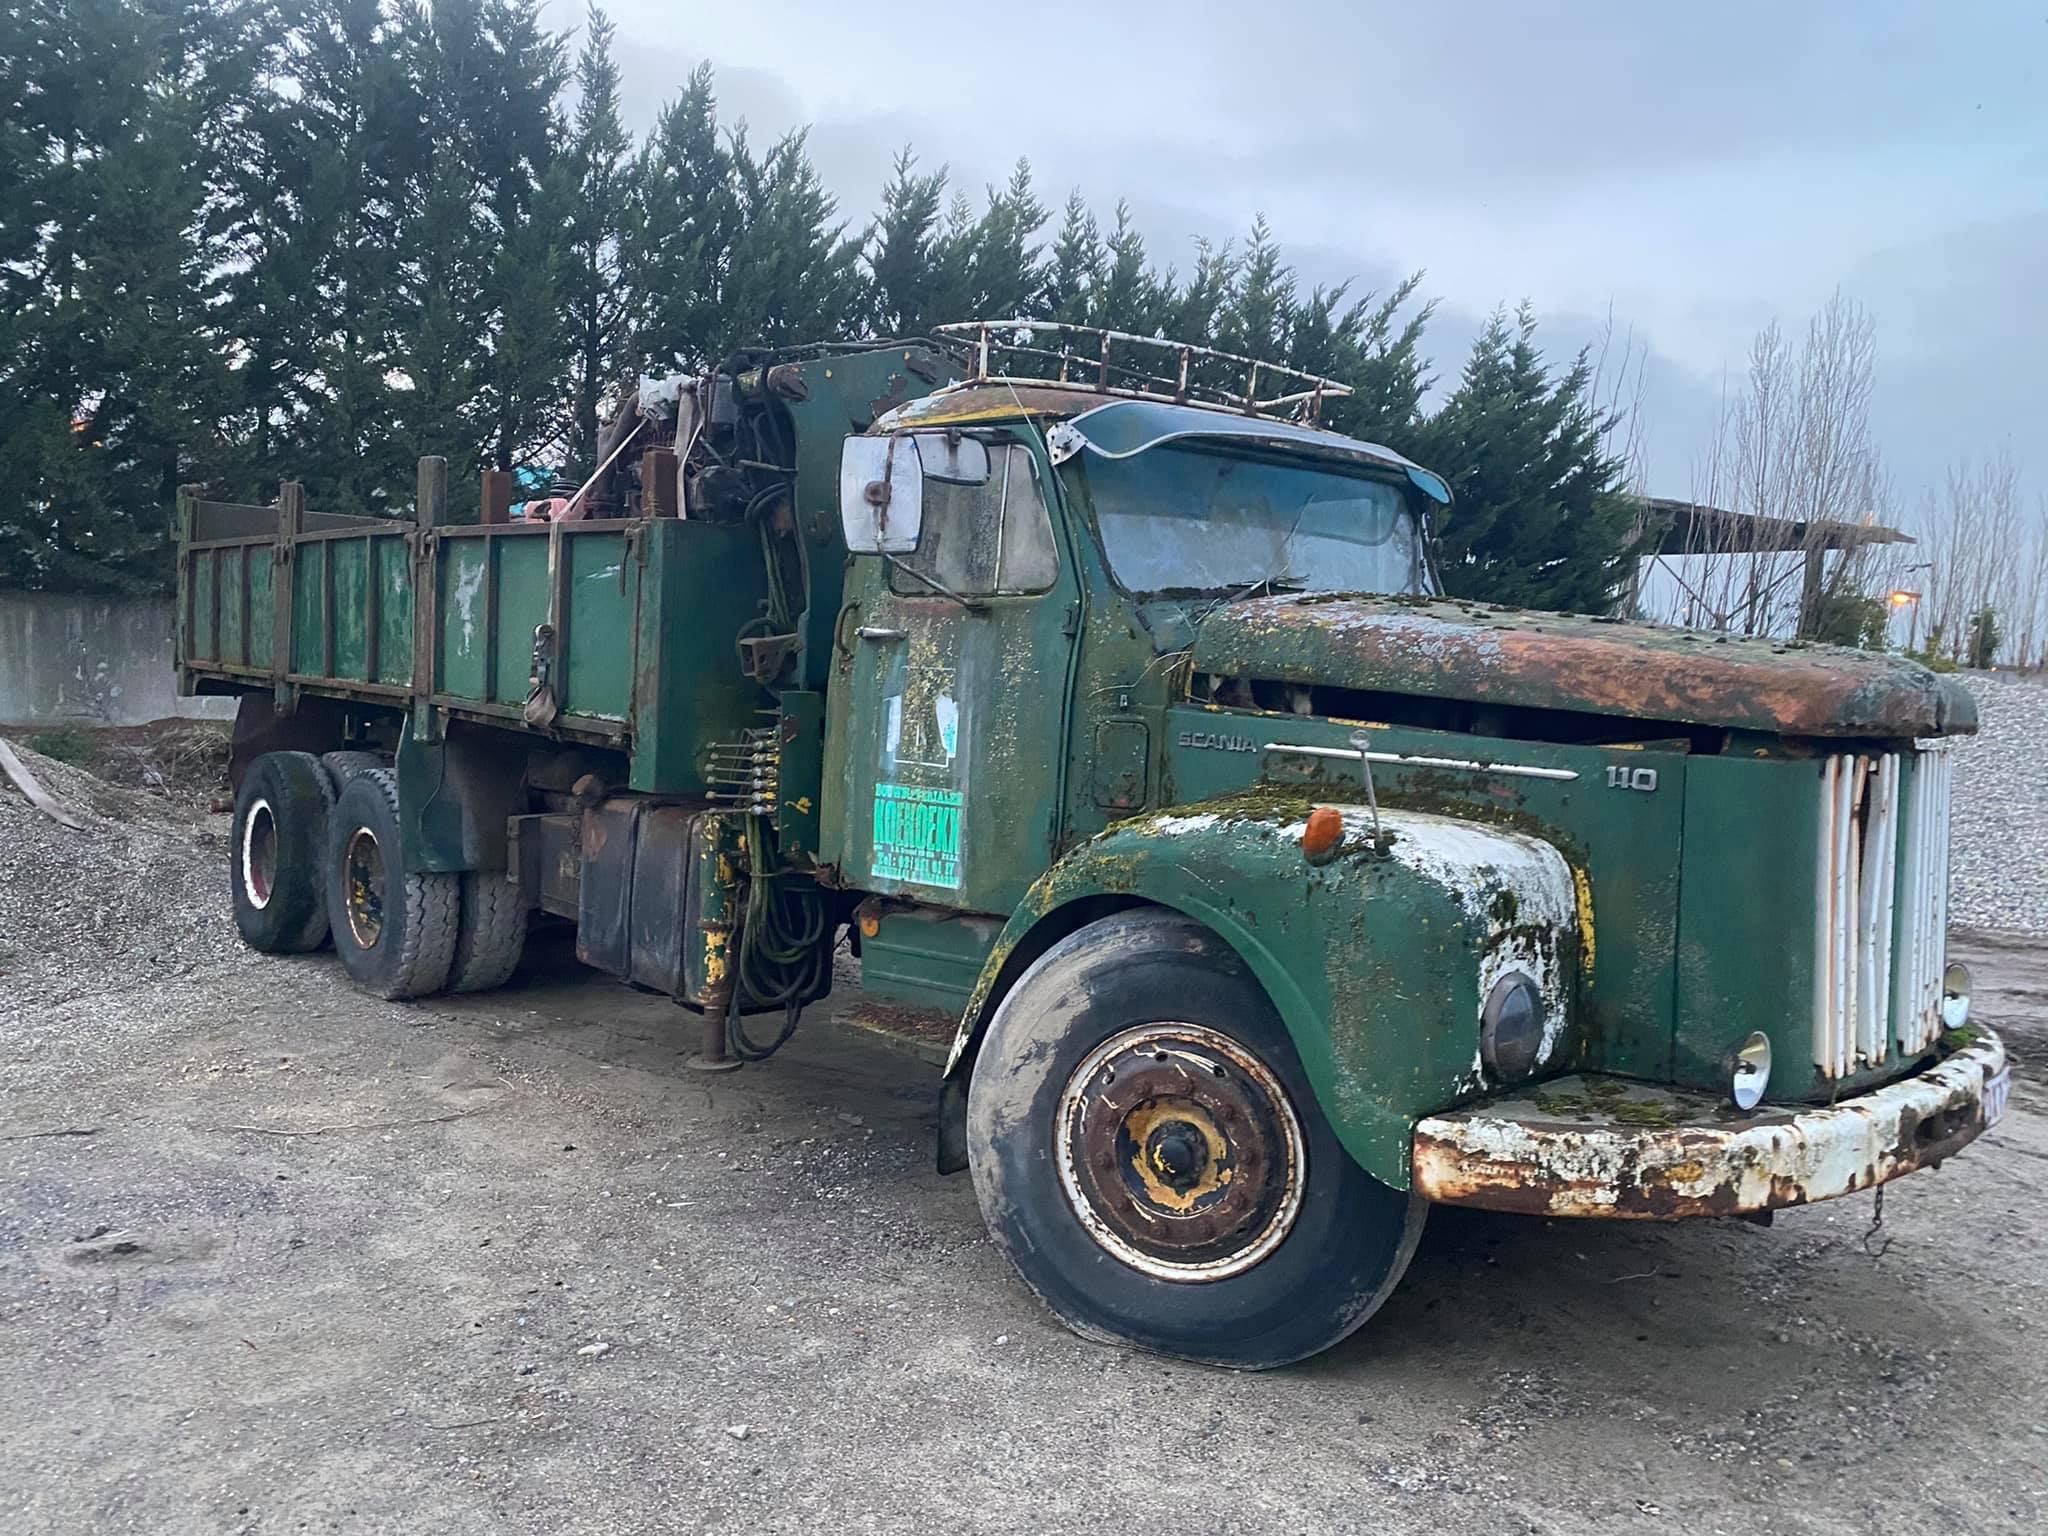 Scania-Vabis-110-Koekoekx-transport-Vilvoorde-(1)